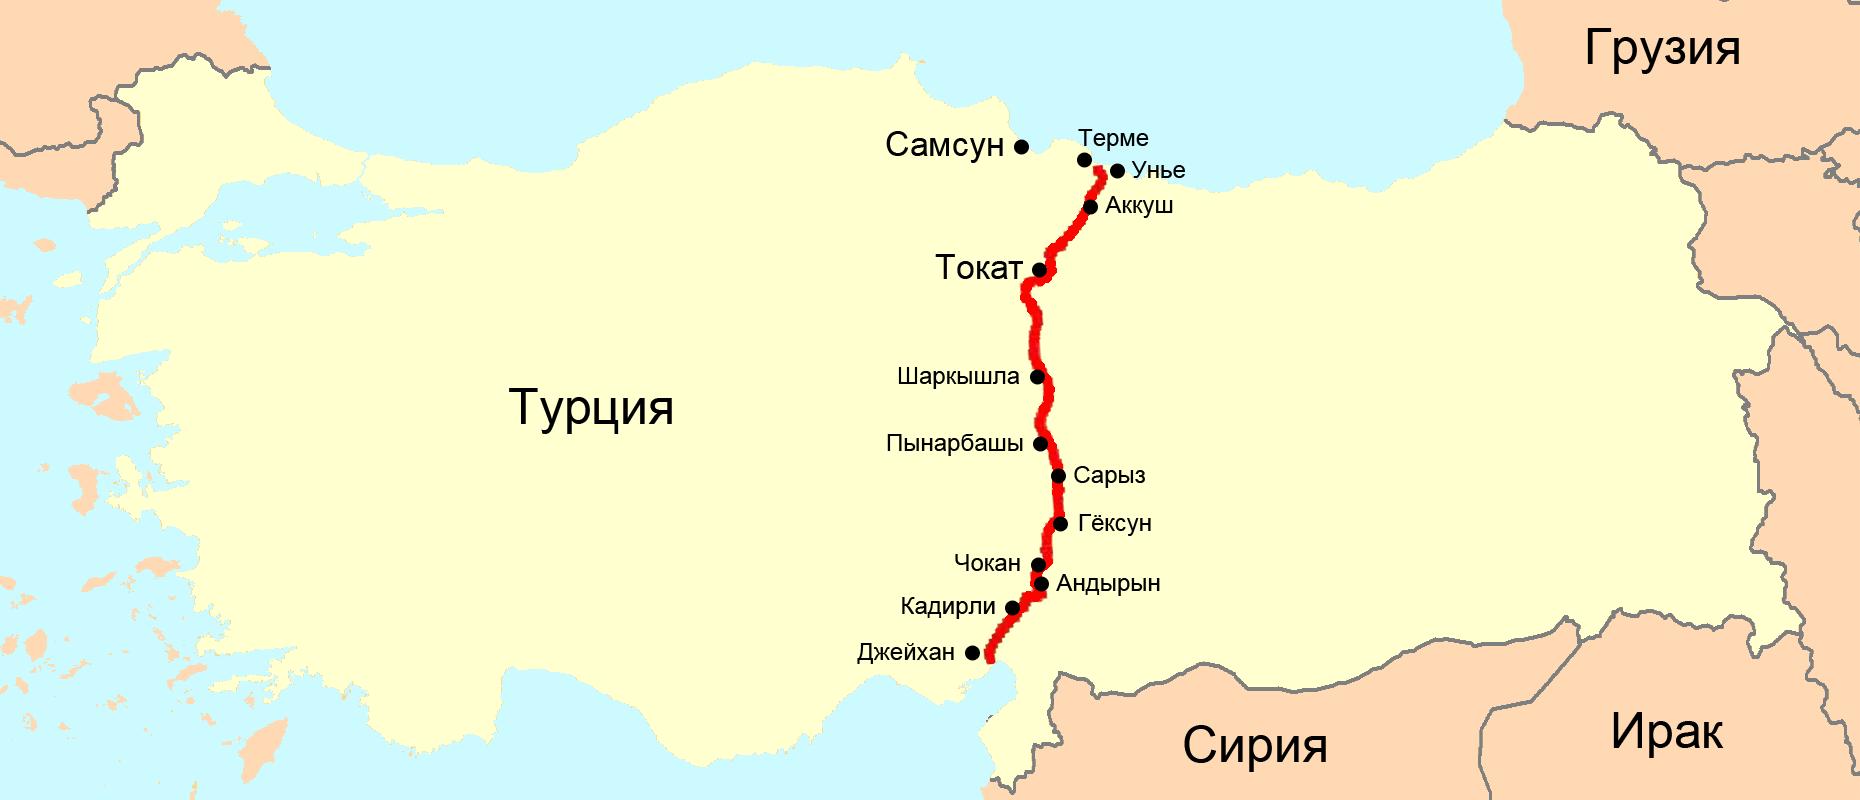 Samsun–Ceyhan pipeline - Wikipedia